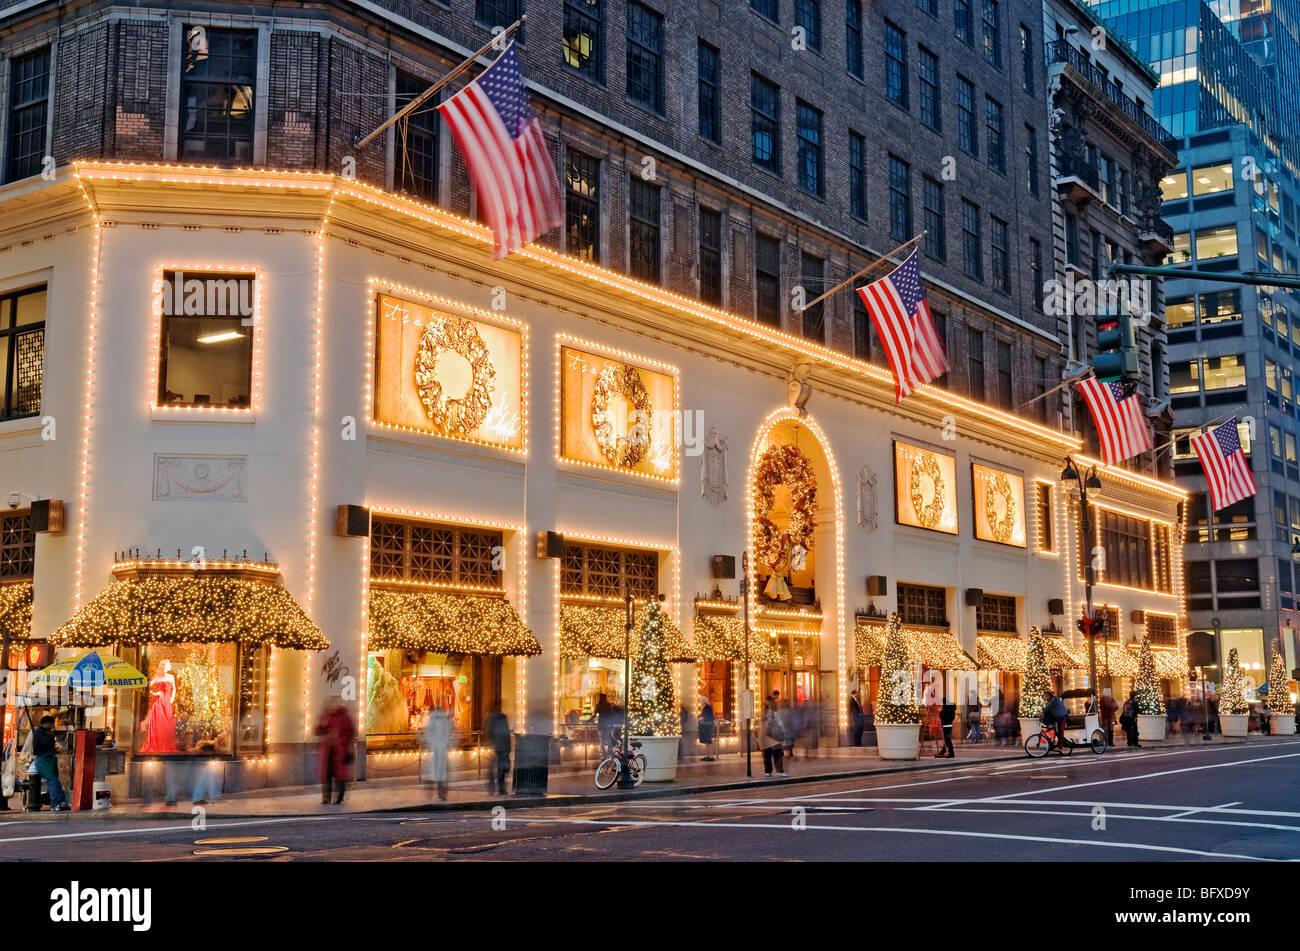 Lord & Taylor 2021 Christmas Windows Photos Christmas Windows At Lord Taylor New York City Fifth Avenue Stock Photo Alamy